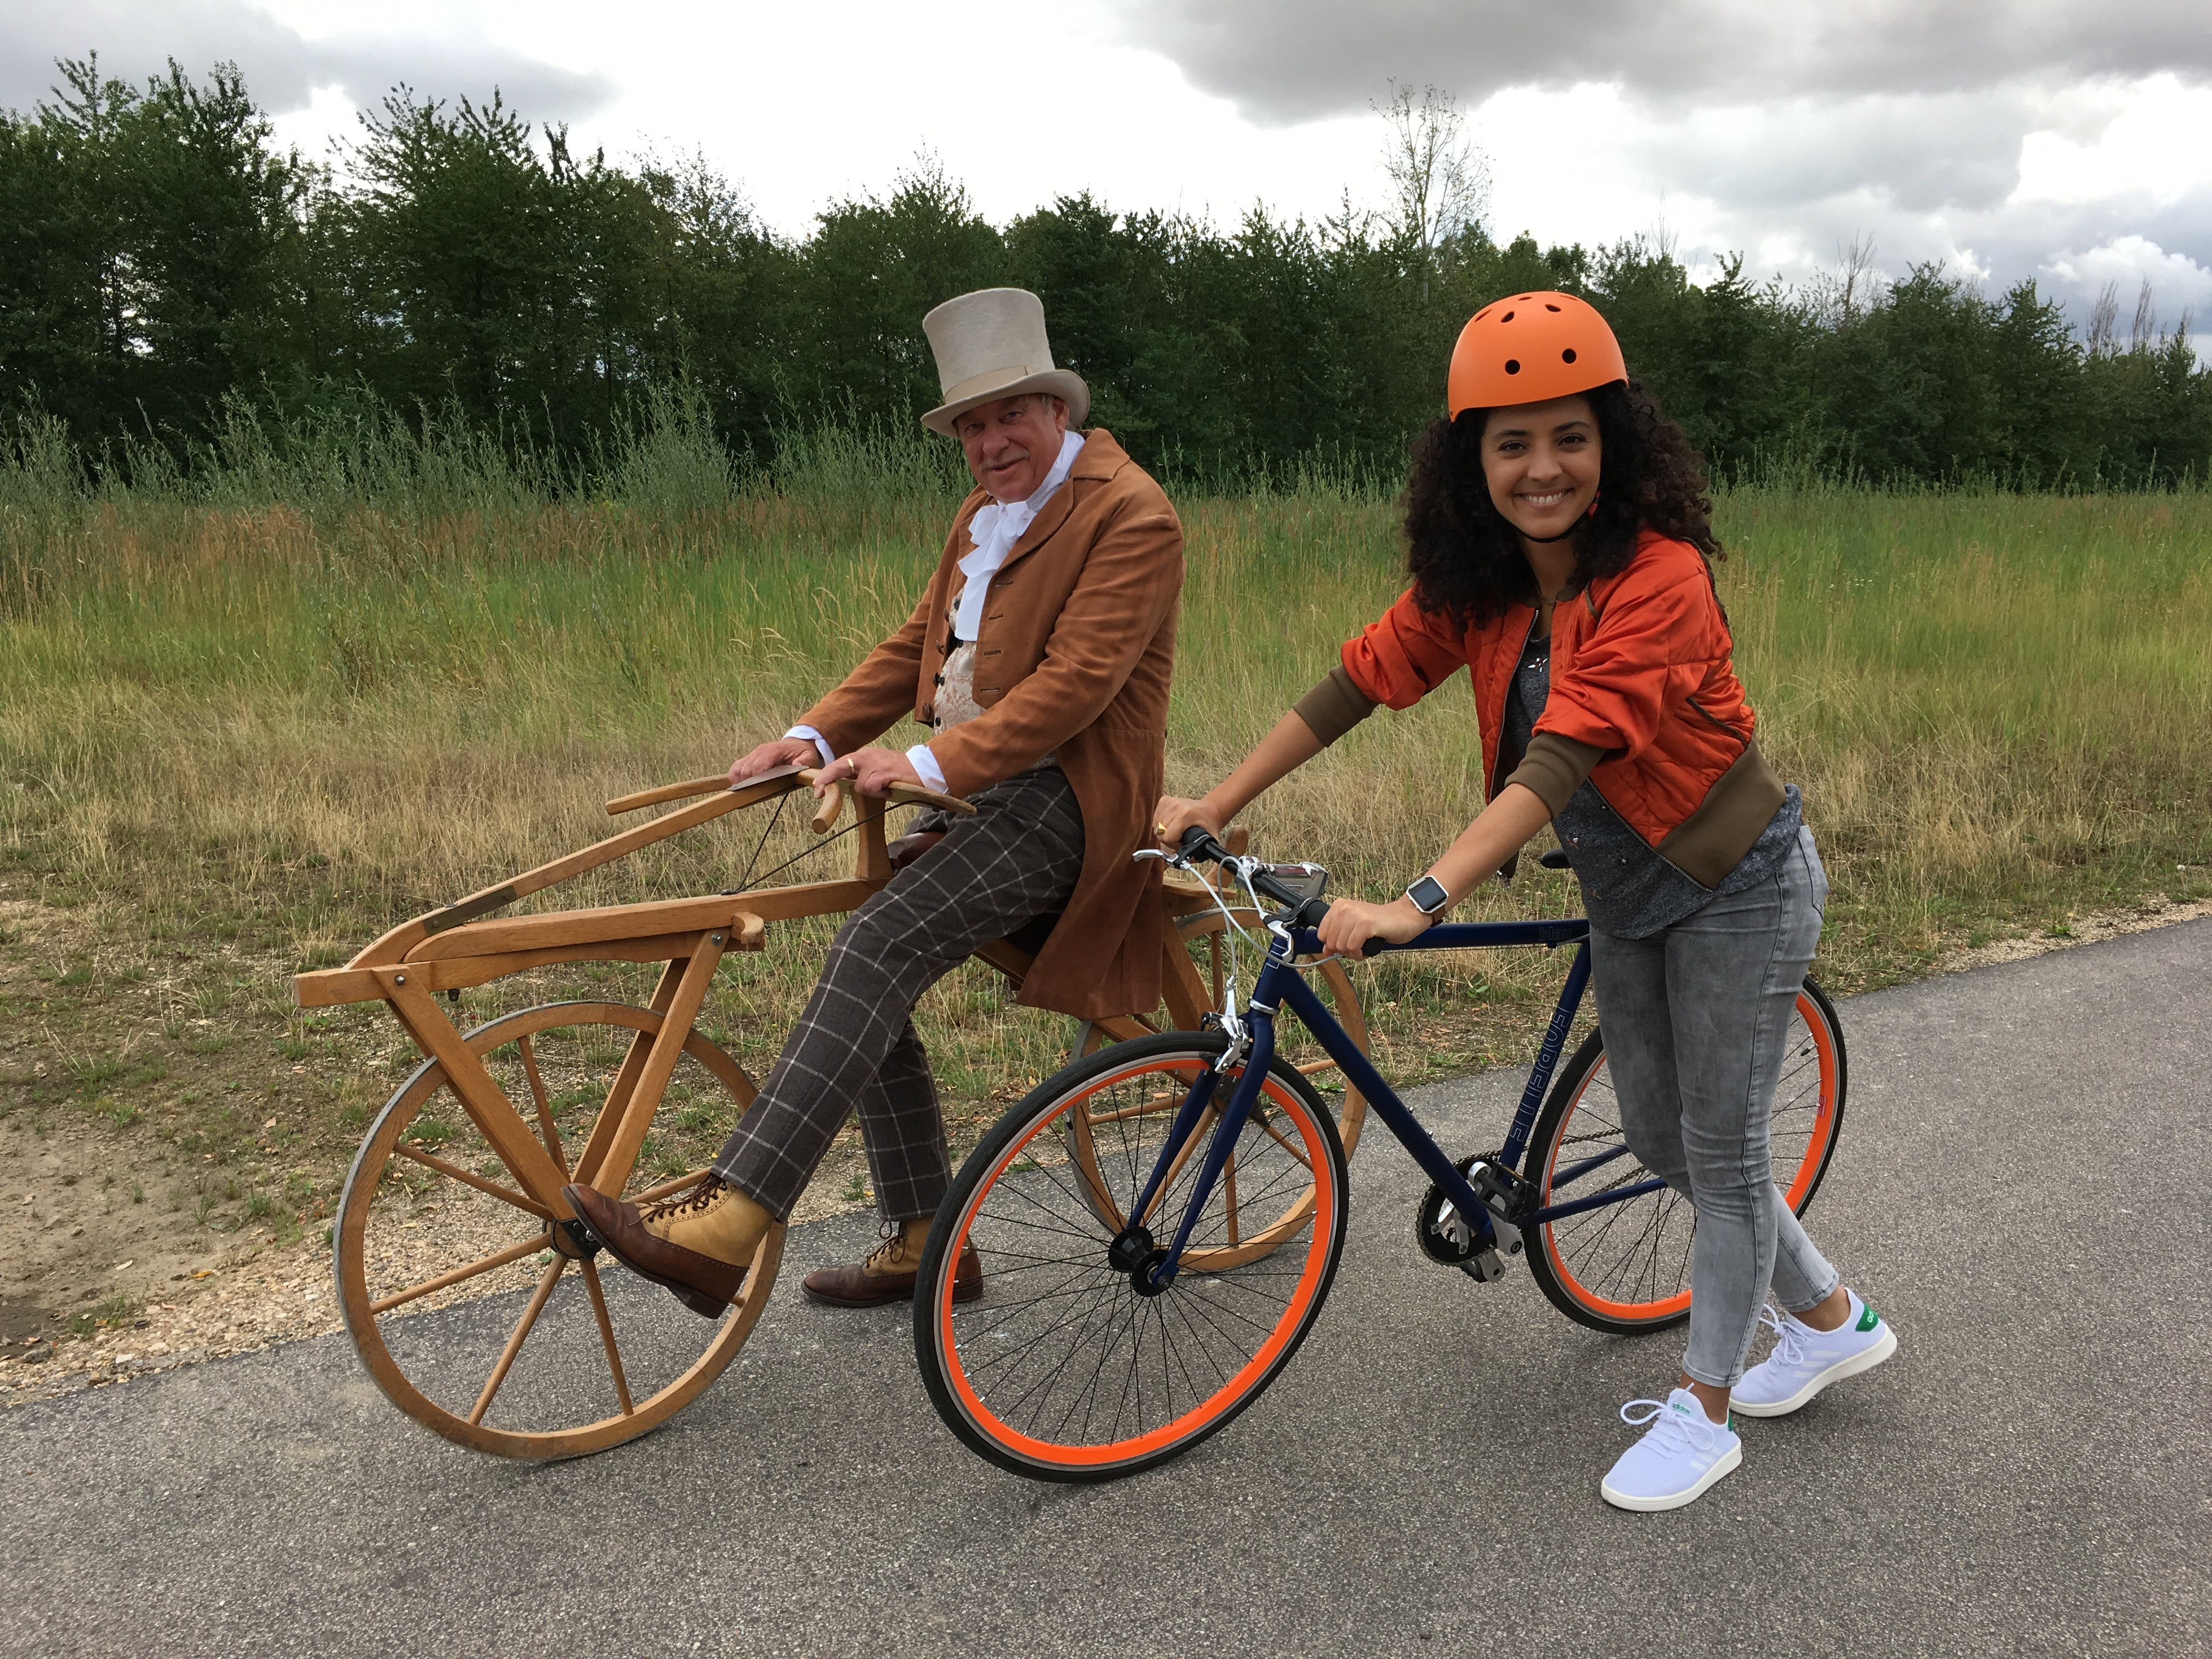 Christoph mit Laufrad Siham mit sportrad